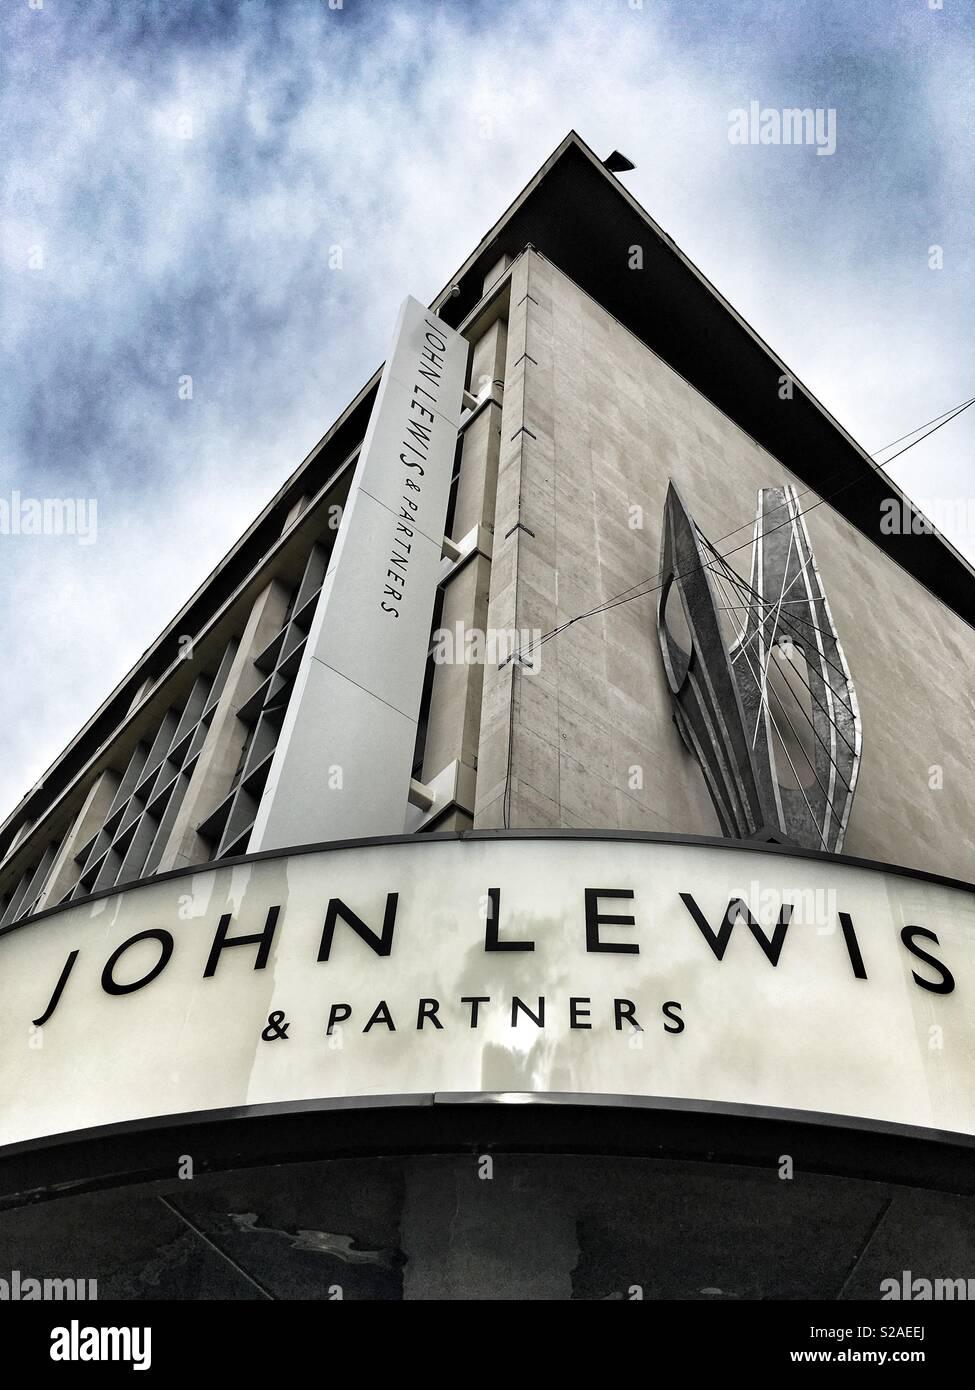 Geox | John Lewis & Partners